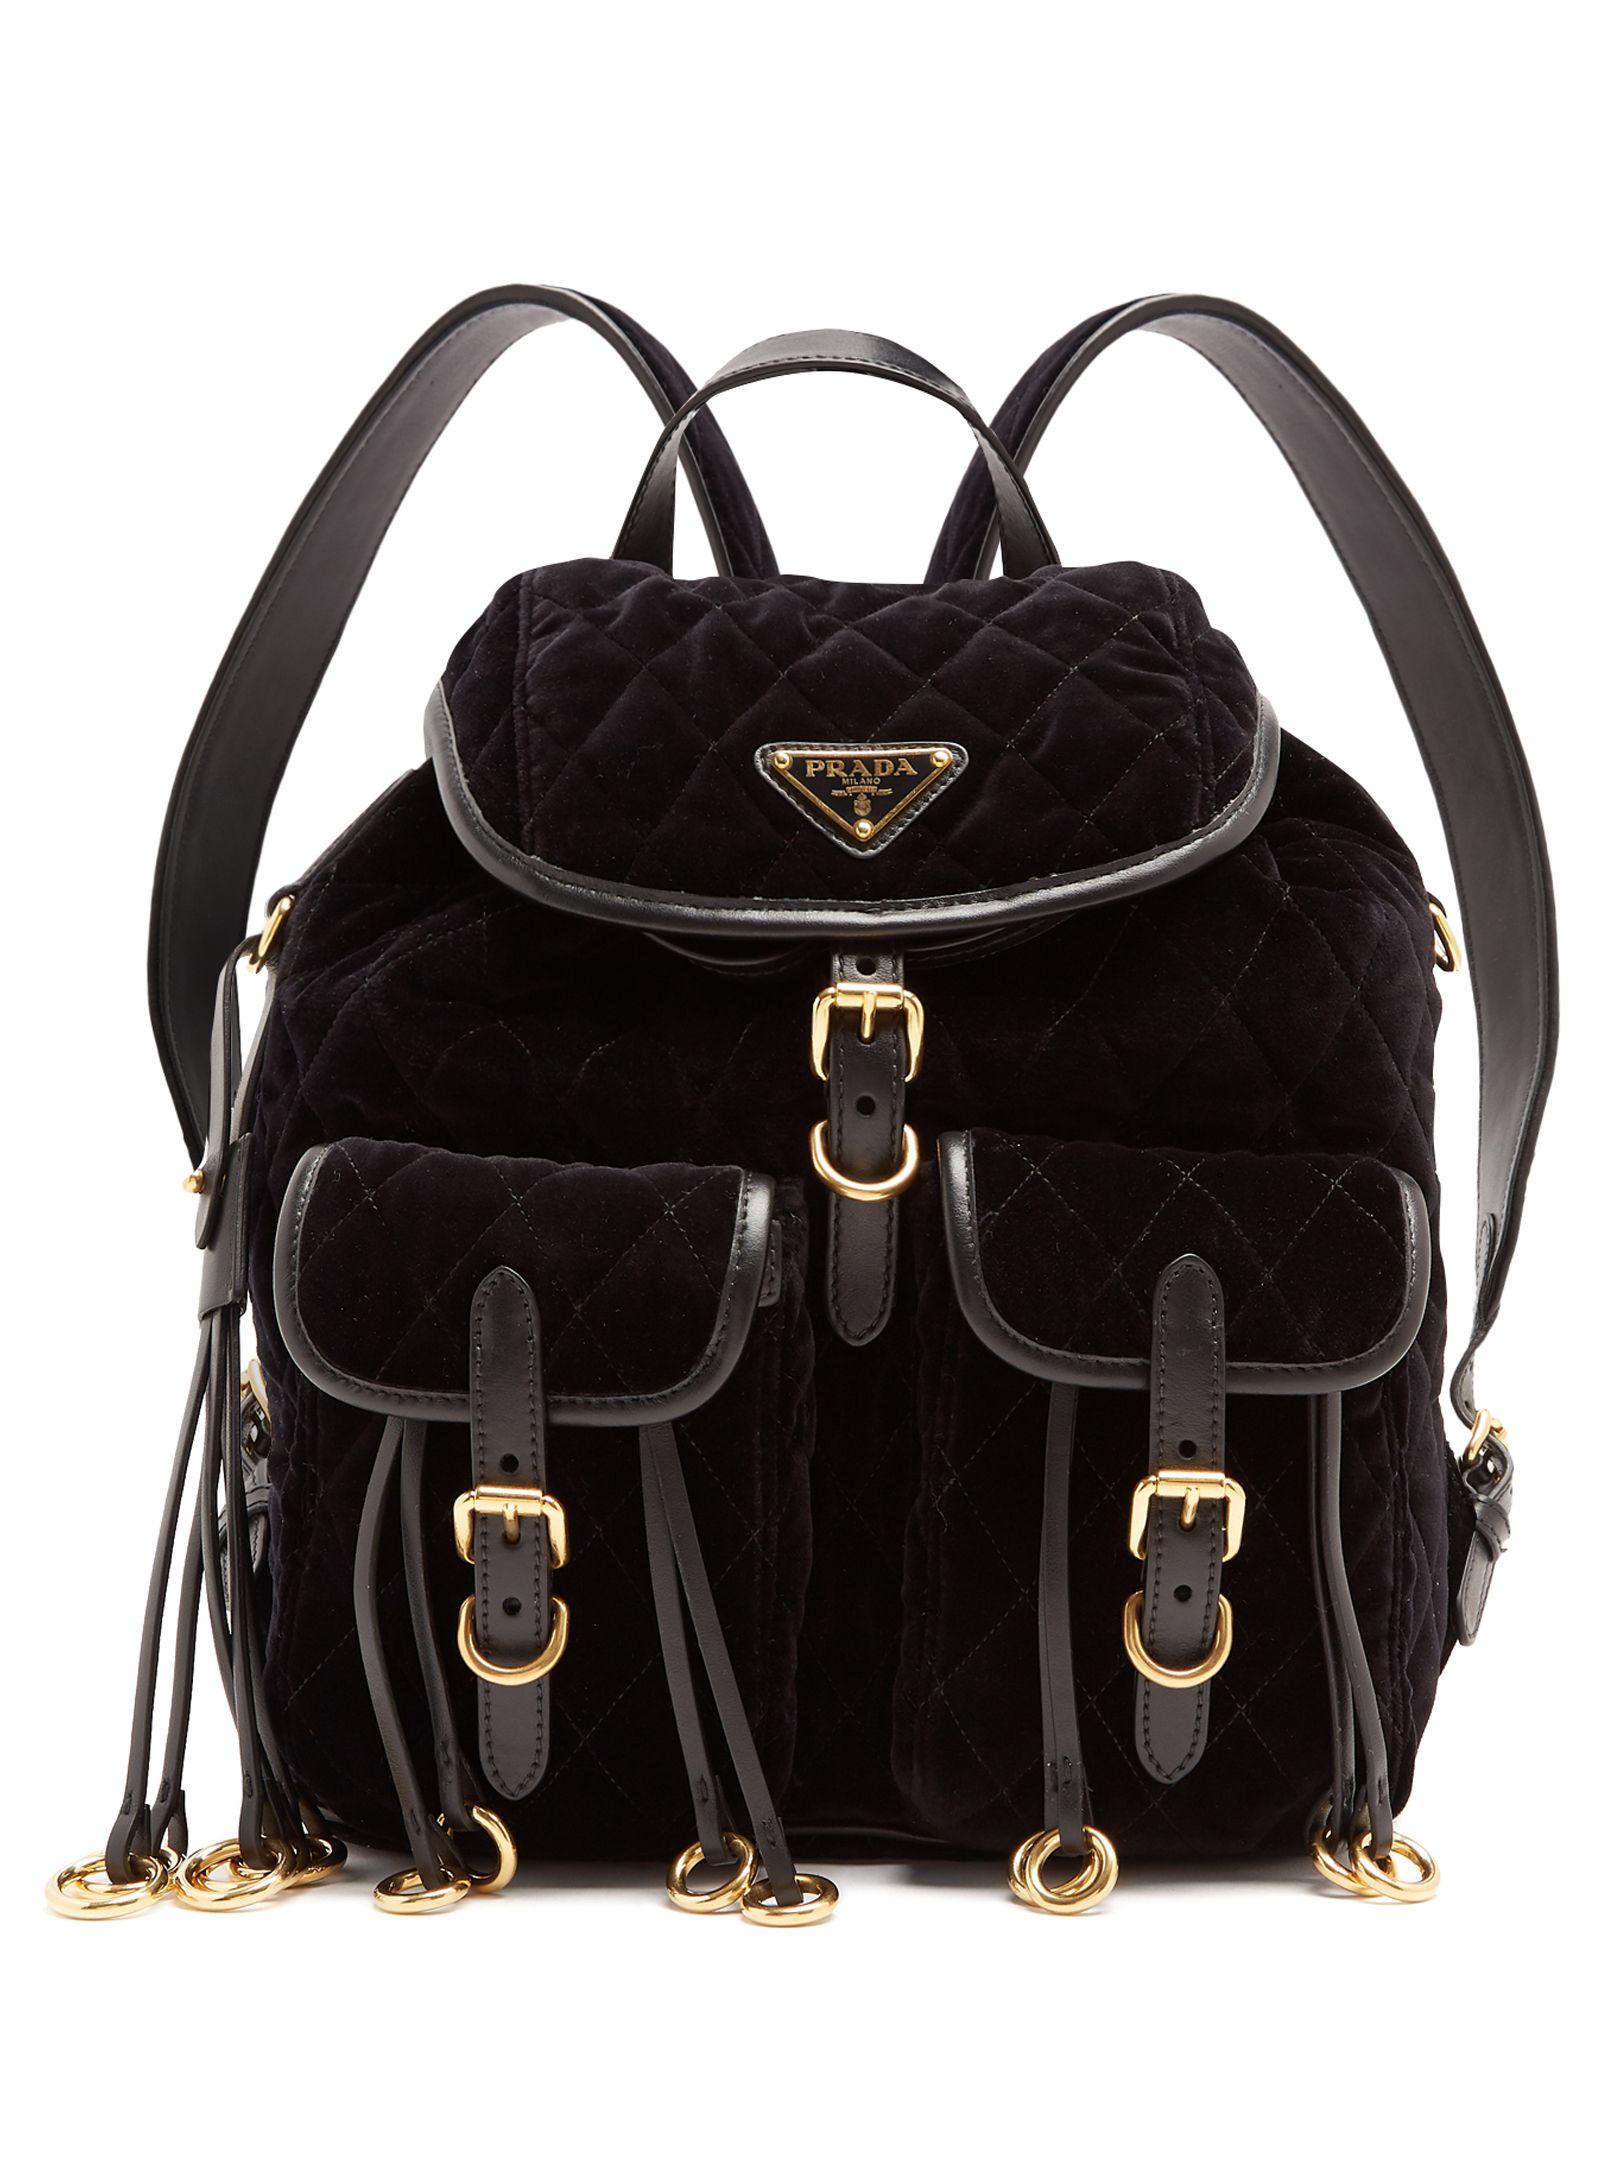 7dc744ef05e1 ... uk prada leather trimmed quilted velvet backpack. prada bags leather  11650 e4fb3